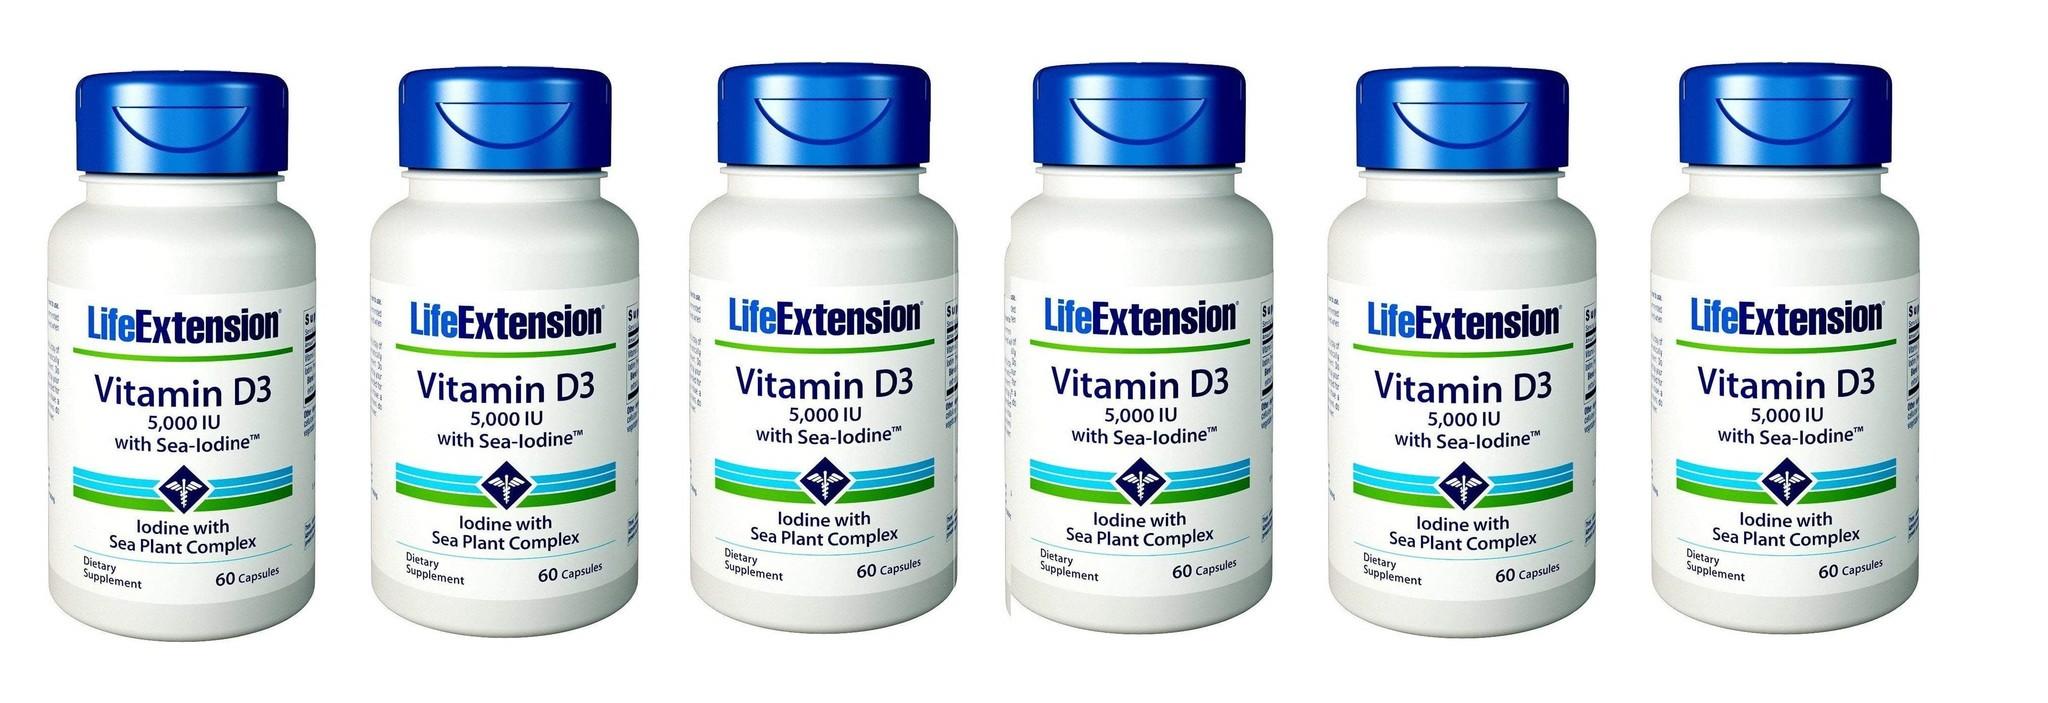 Life Extension Vitamin D3 5000 IU With Sea-iodine, 6-packs